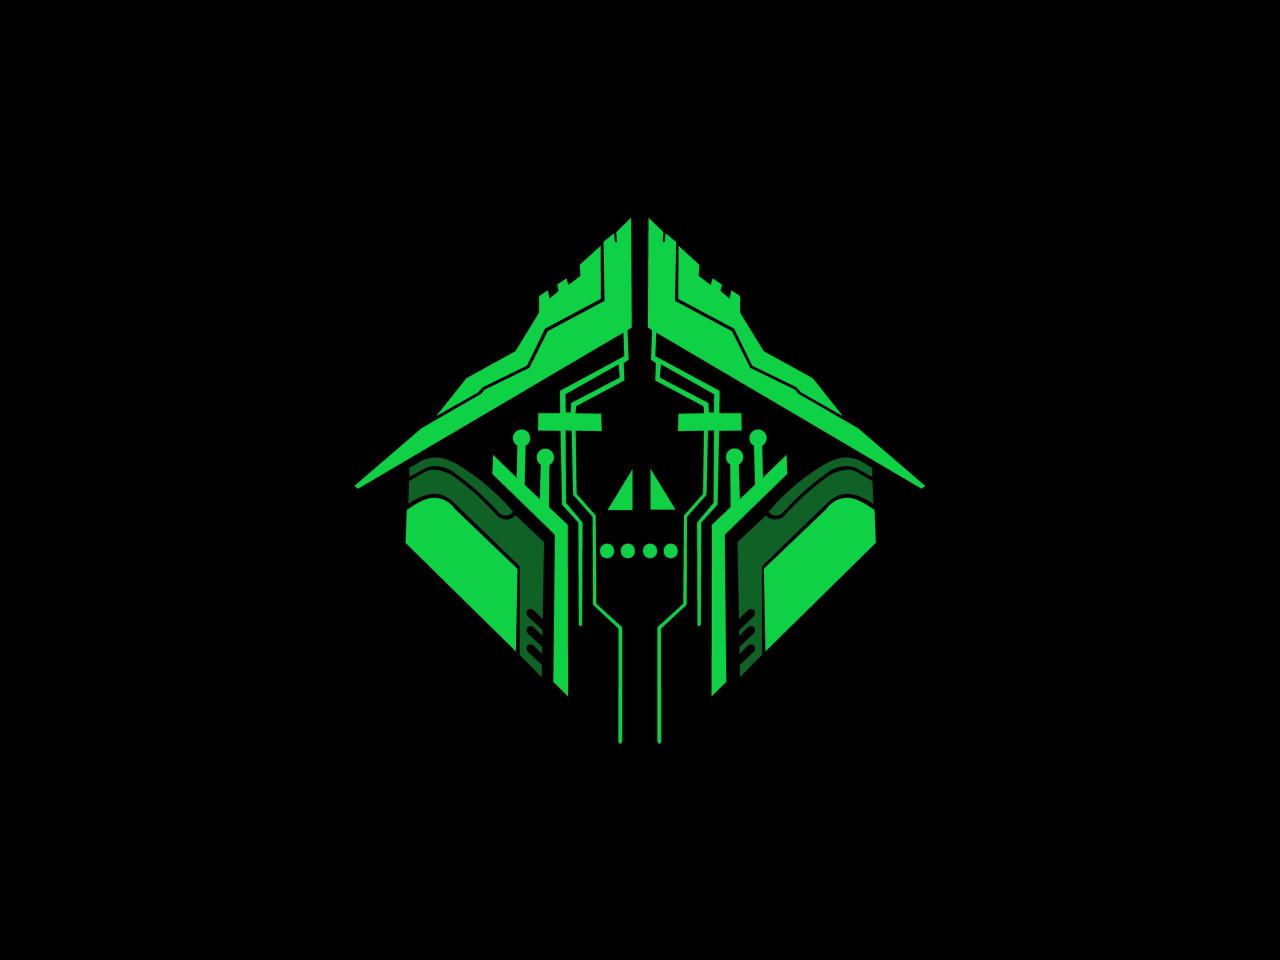 1280x960 Crypto Apex Legends 4K Logo 1280x960 Resolution ...